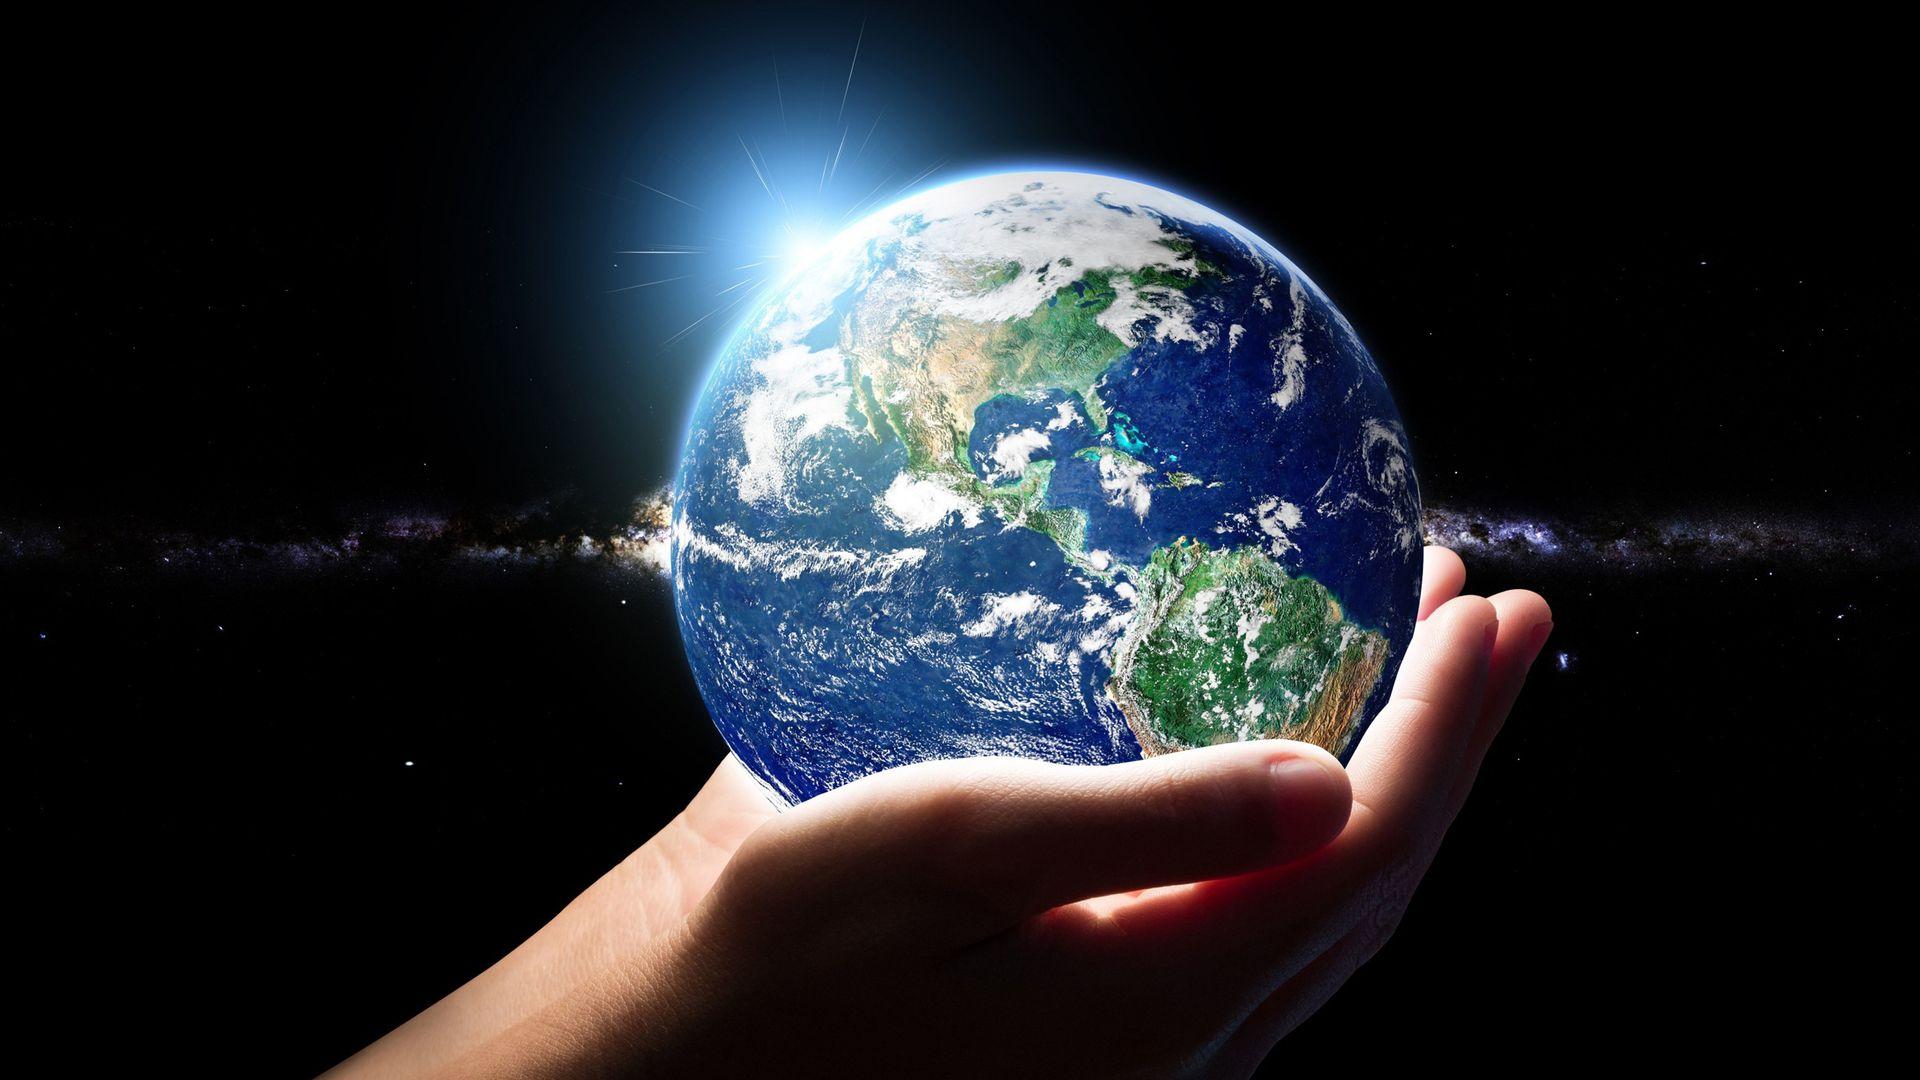 Earth-Planet-3D-in-Hands-Digital-Art-Wallpaper.jpg